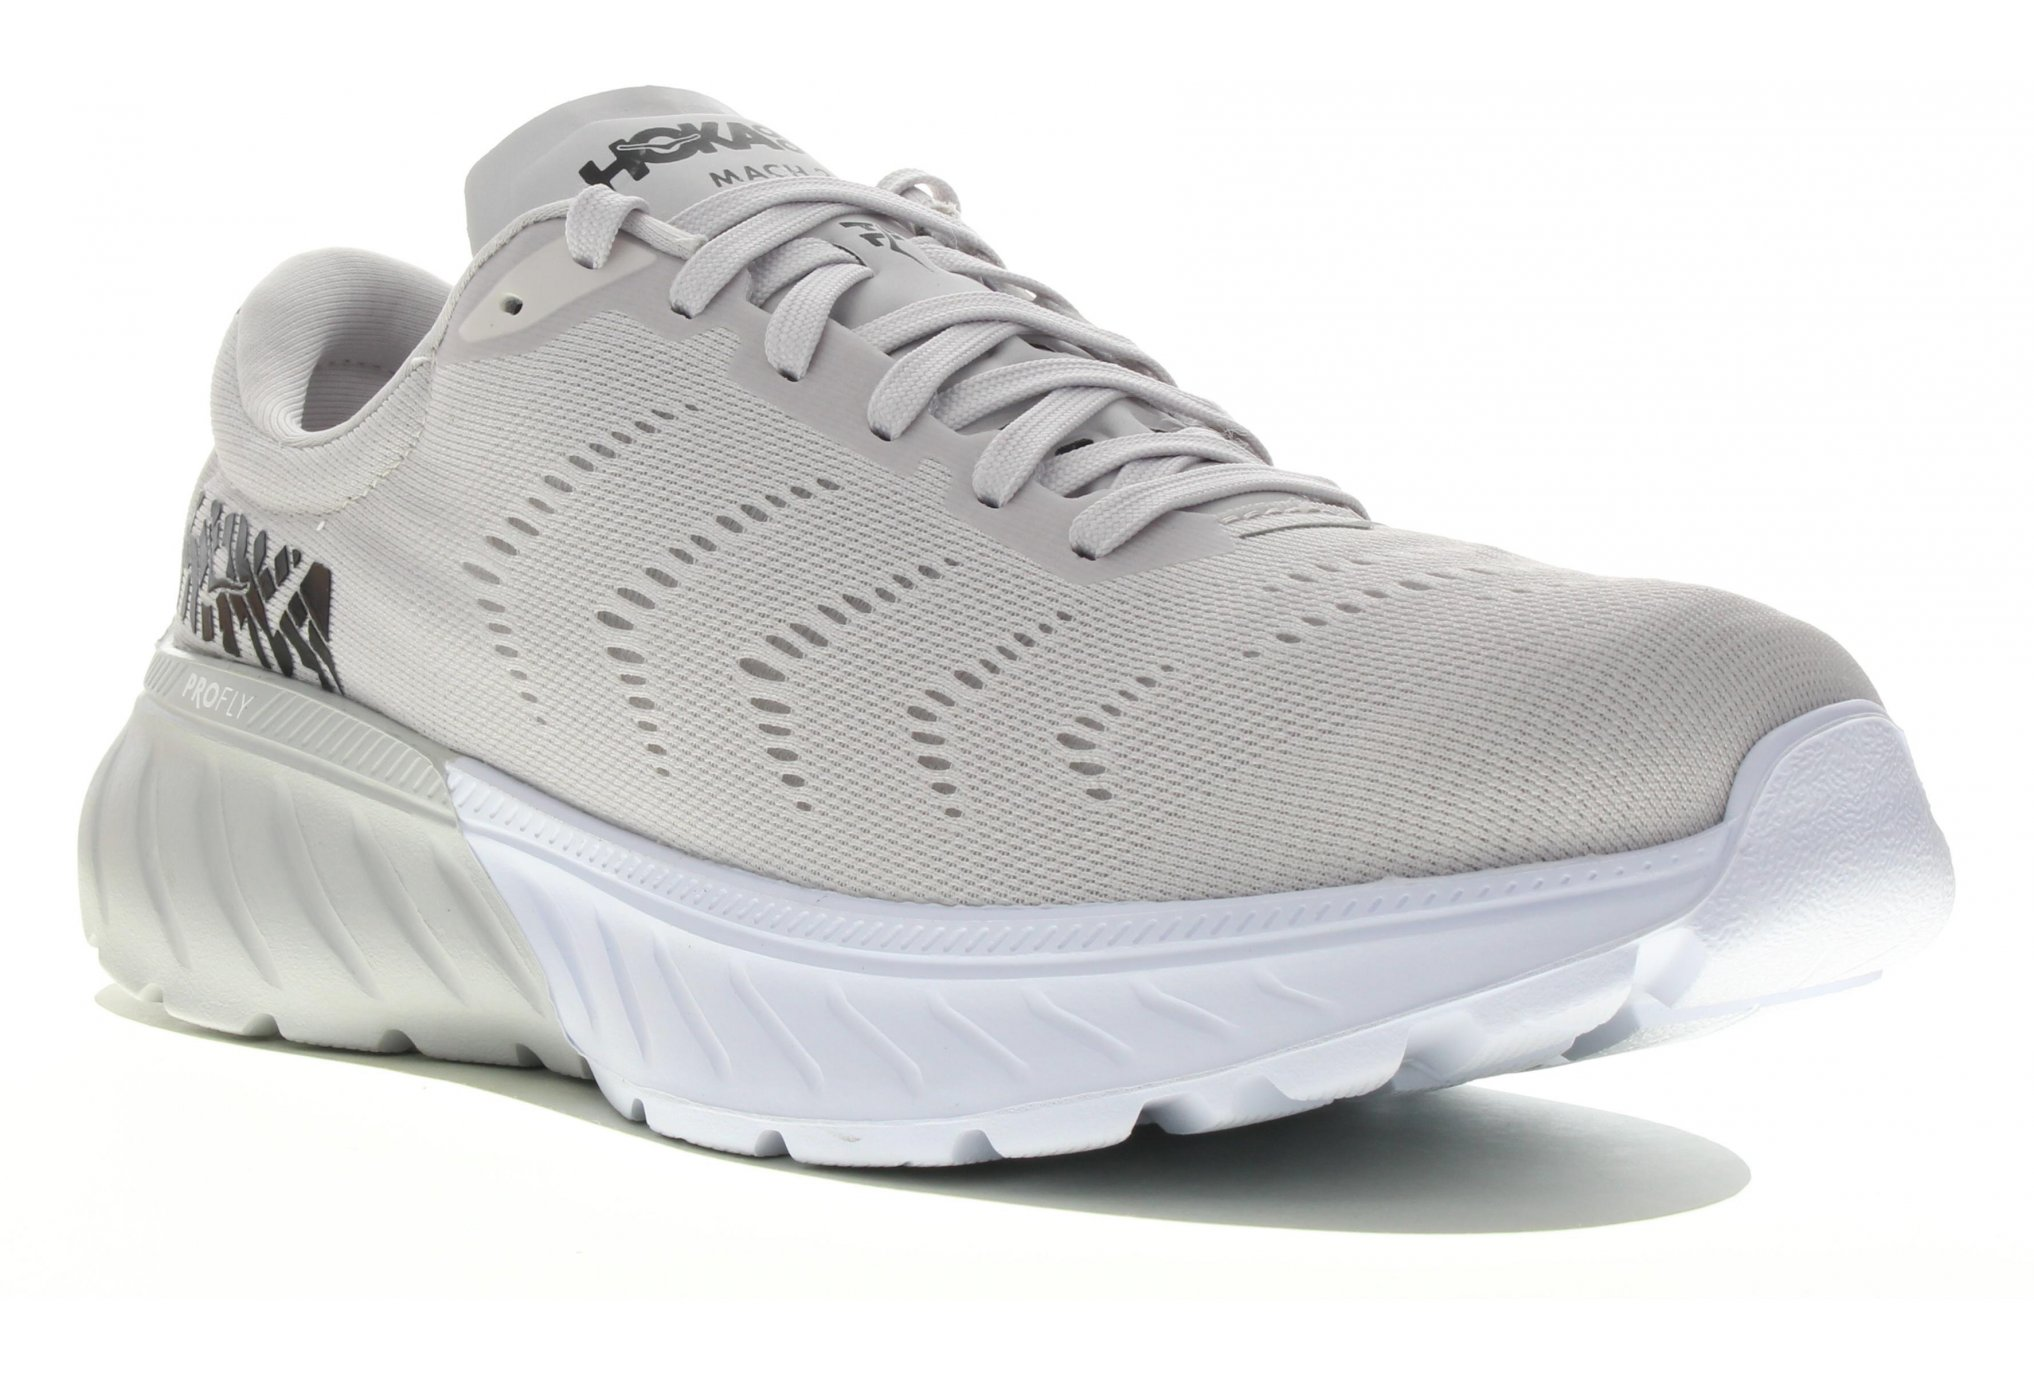 Hoka One One Mach 2 Chaussures homme